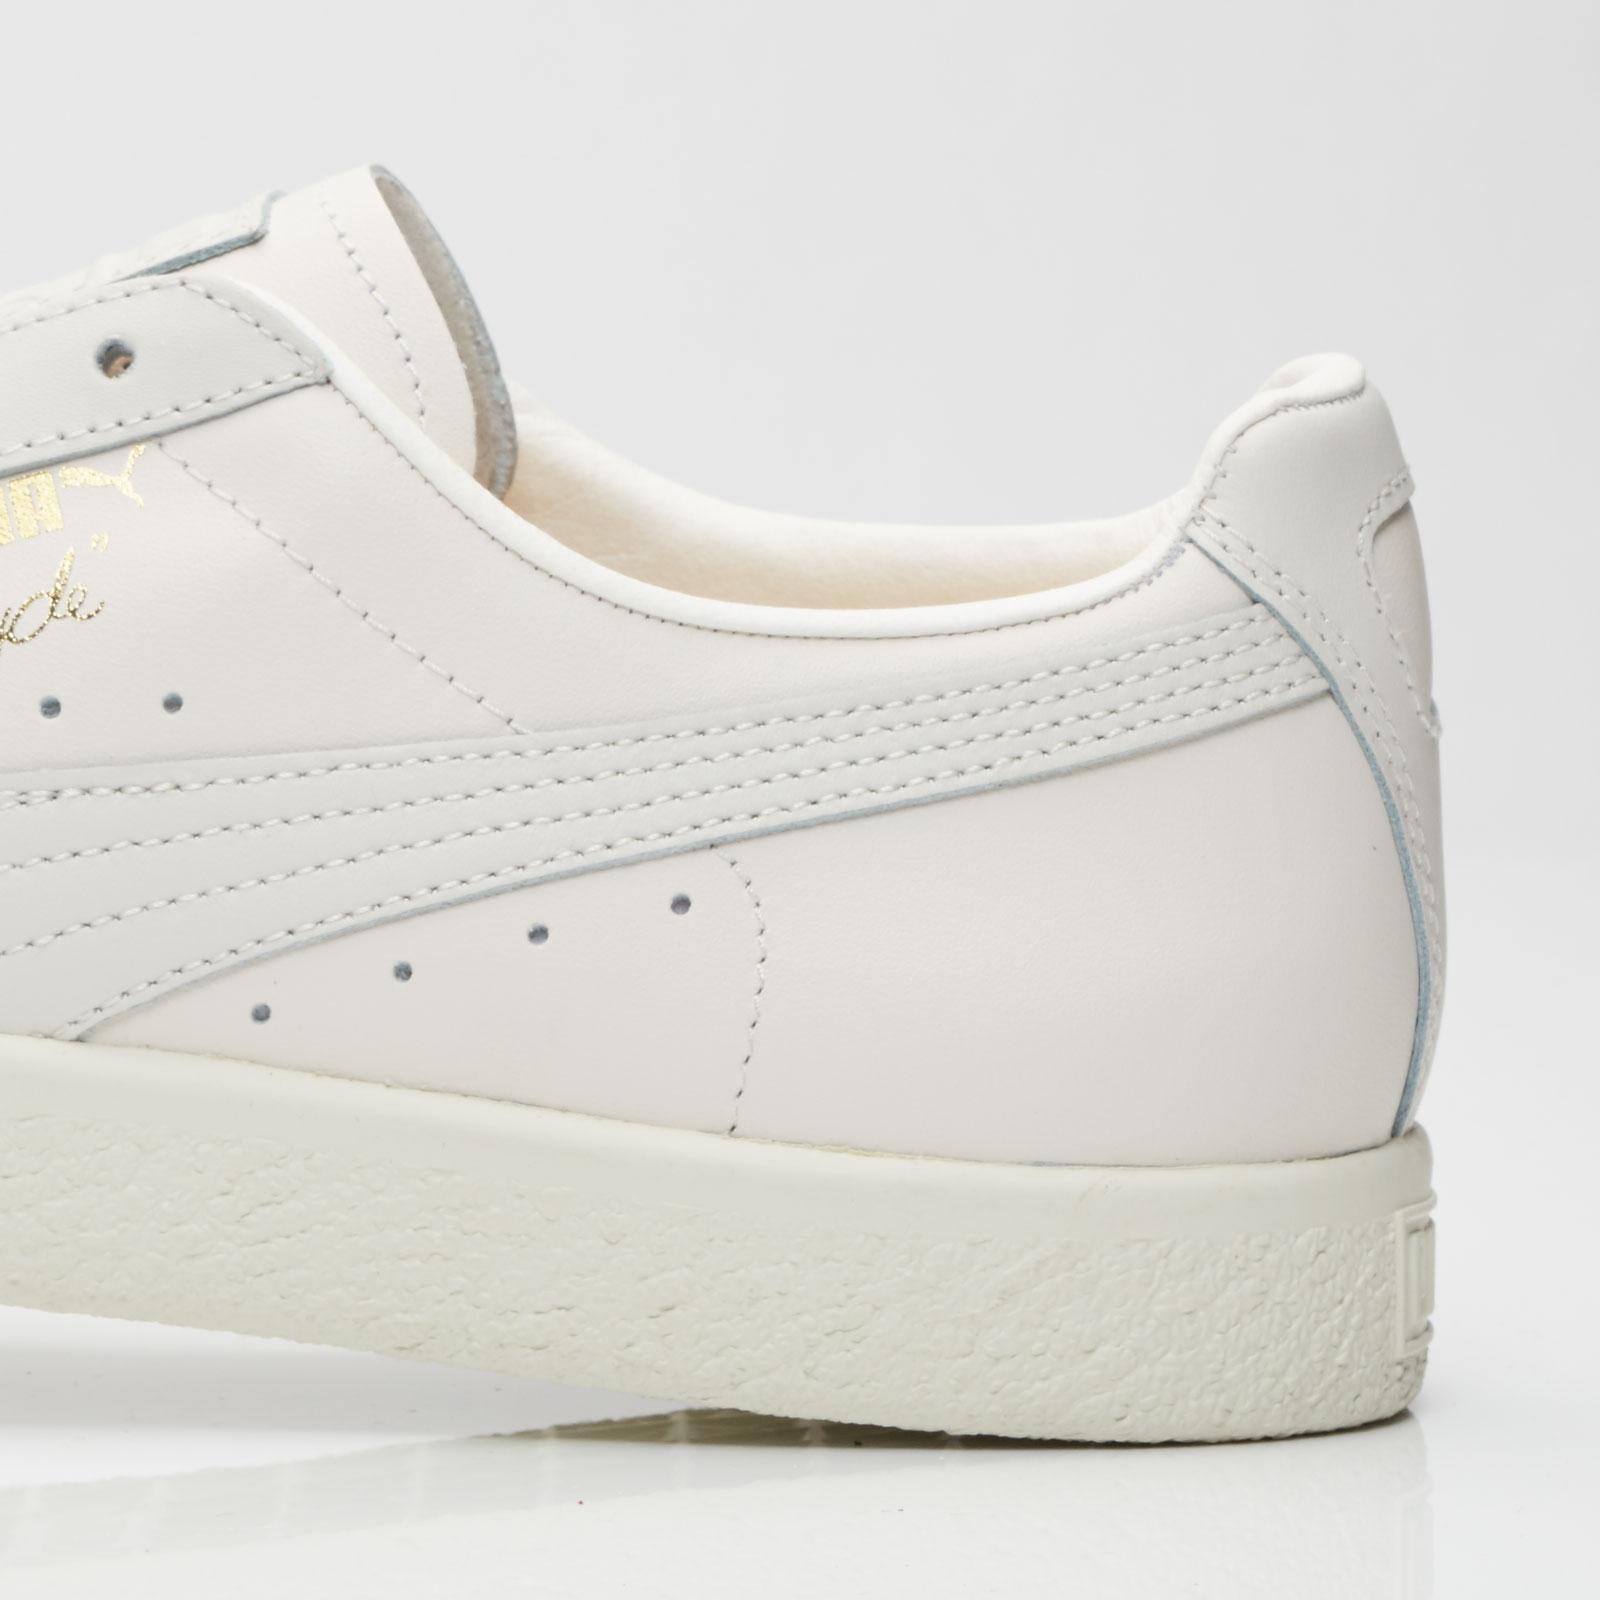 49a49f14deaa Puma Clyde Natural - 363617-02 - Sneakersnstuff